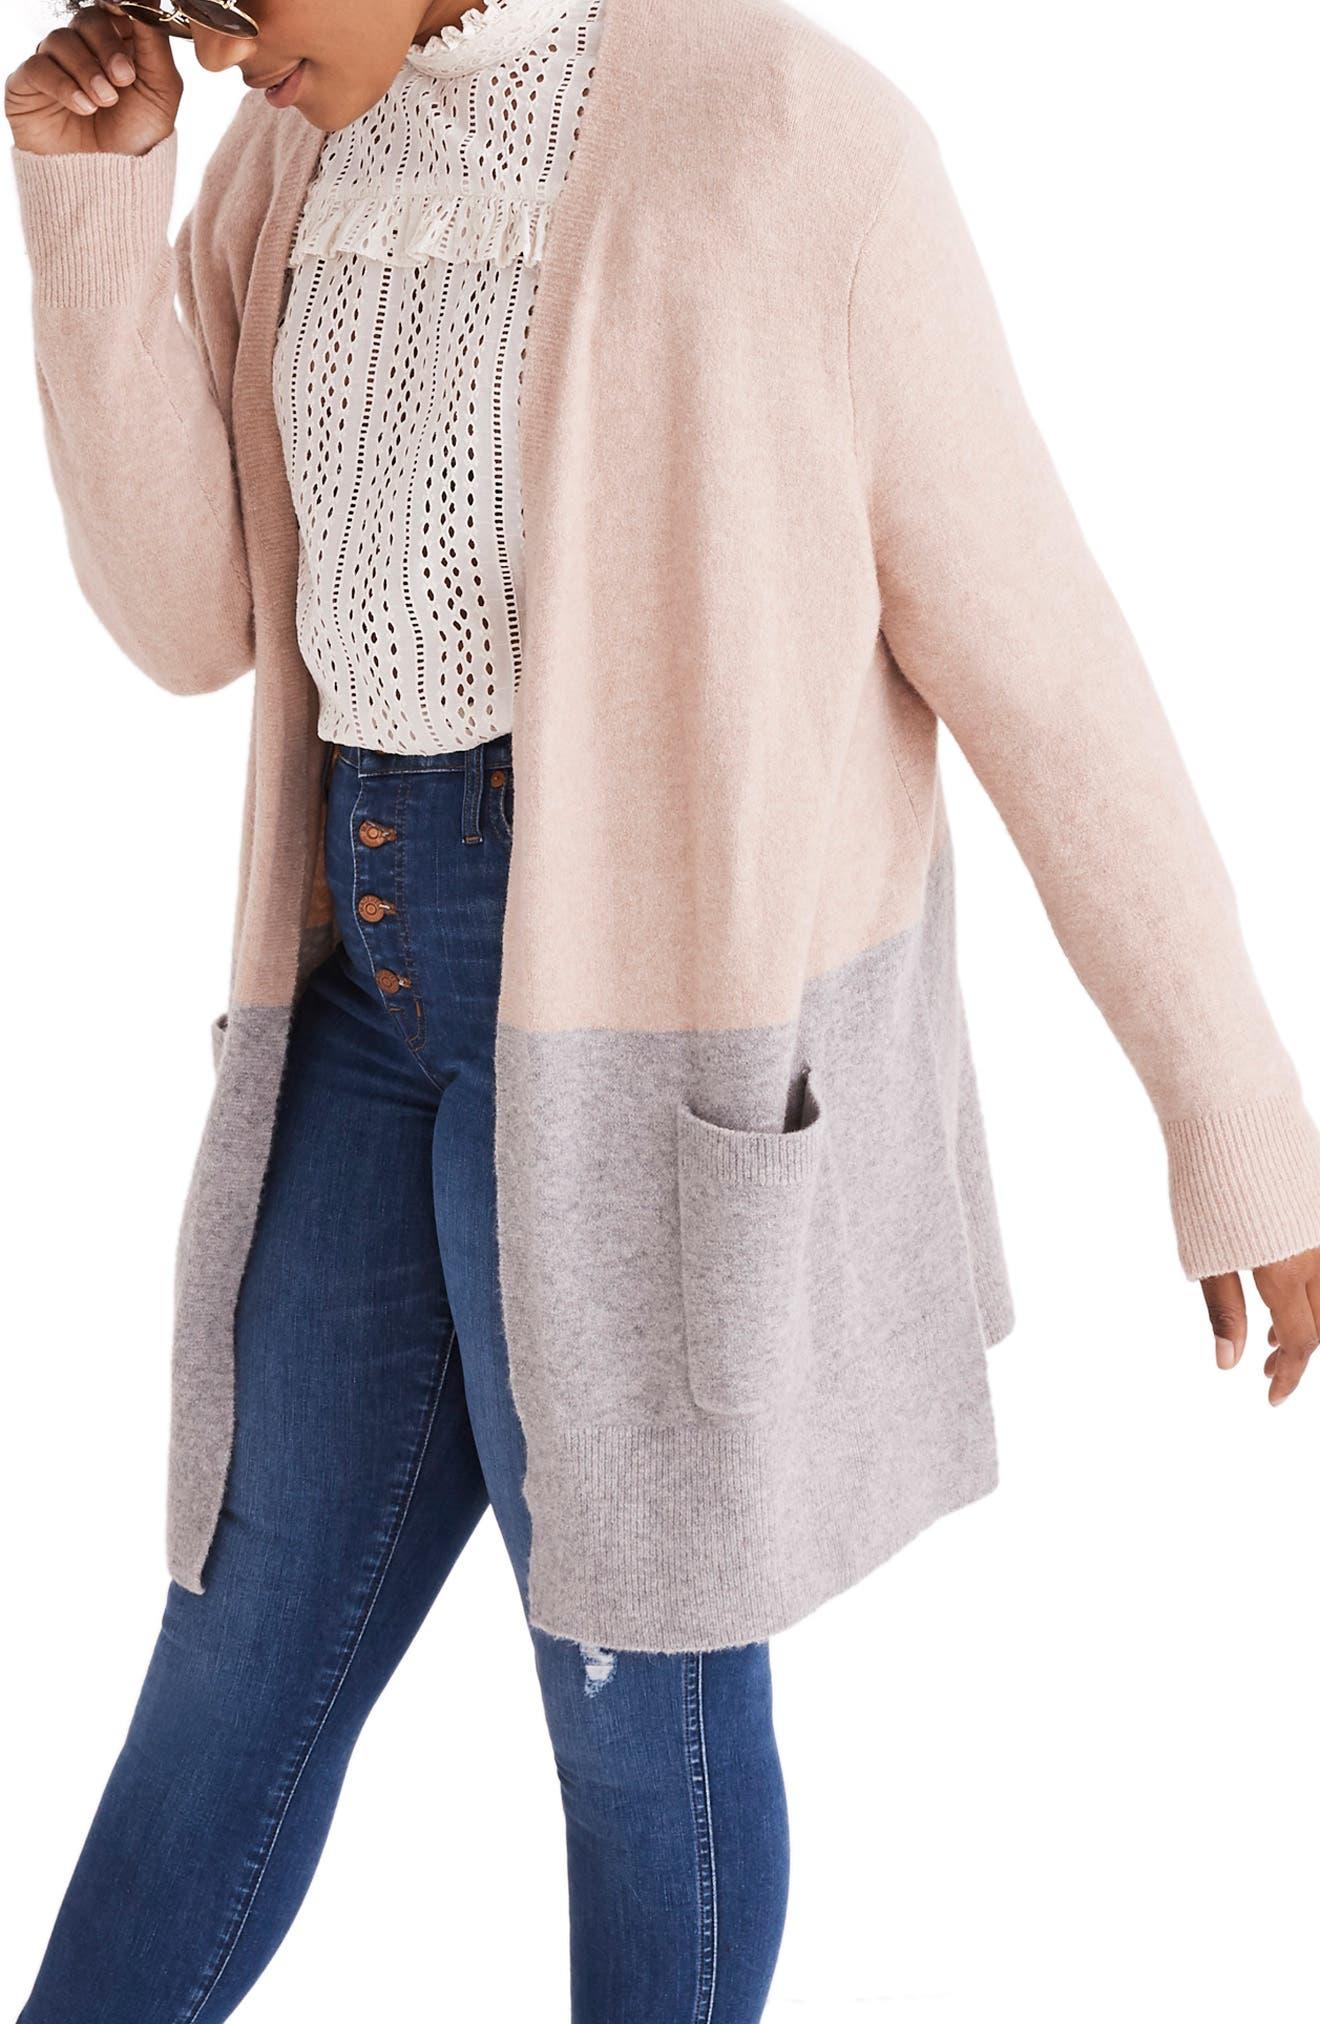 Kent Colorblock Cardigan Sweater,                             Alternate thumbnail 2, color,                             HEATHER BEIGE